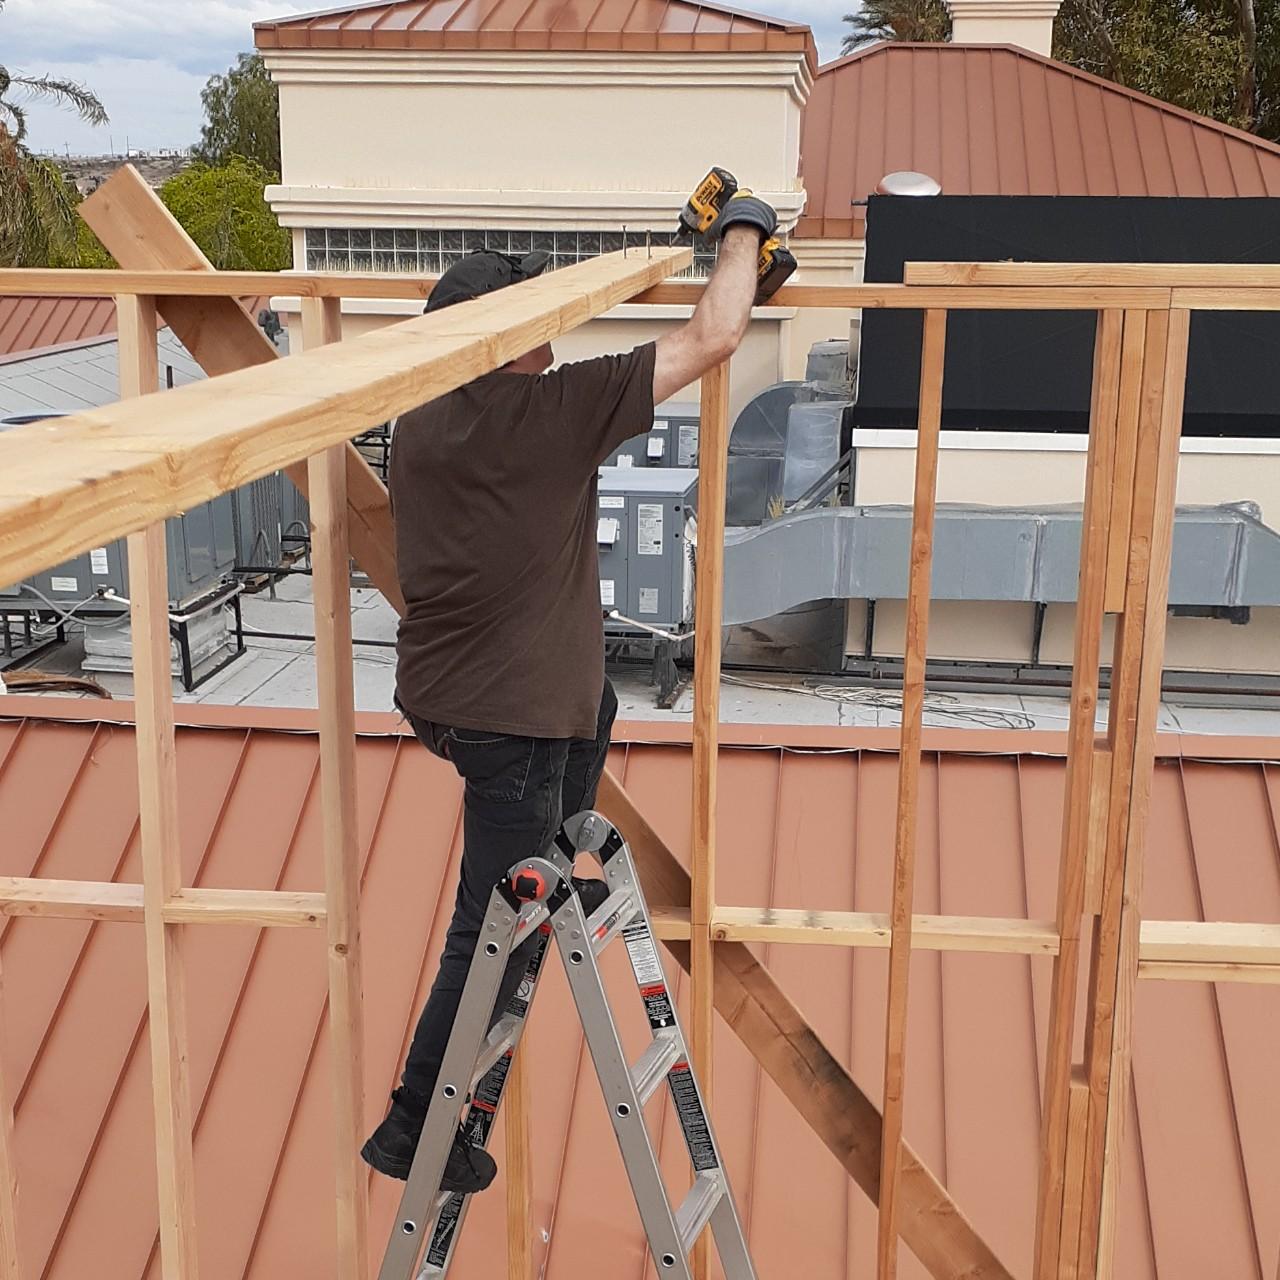 carpentry-wood-framing-second-floor-home-addition--framing-96